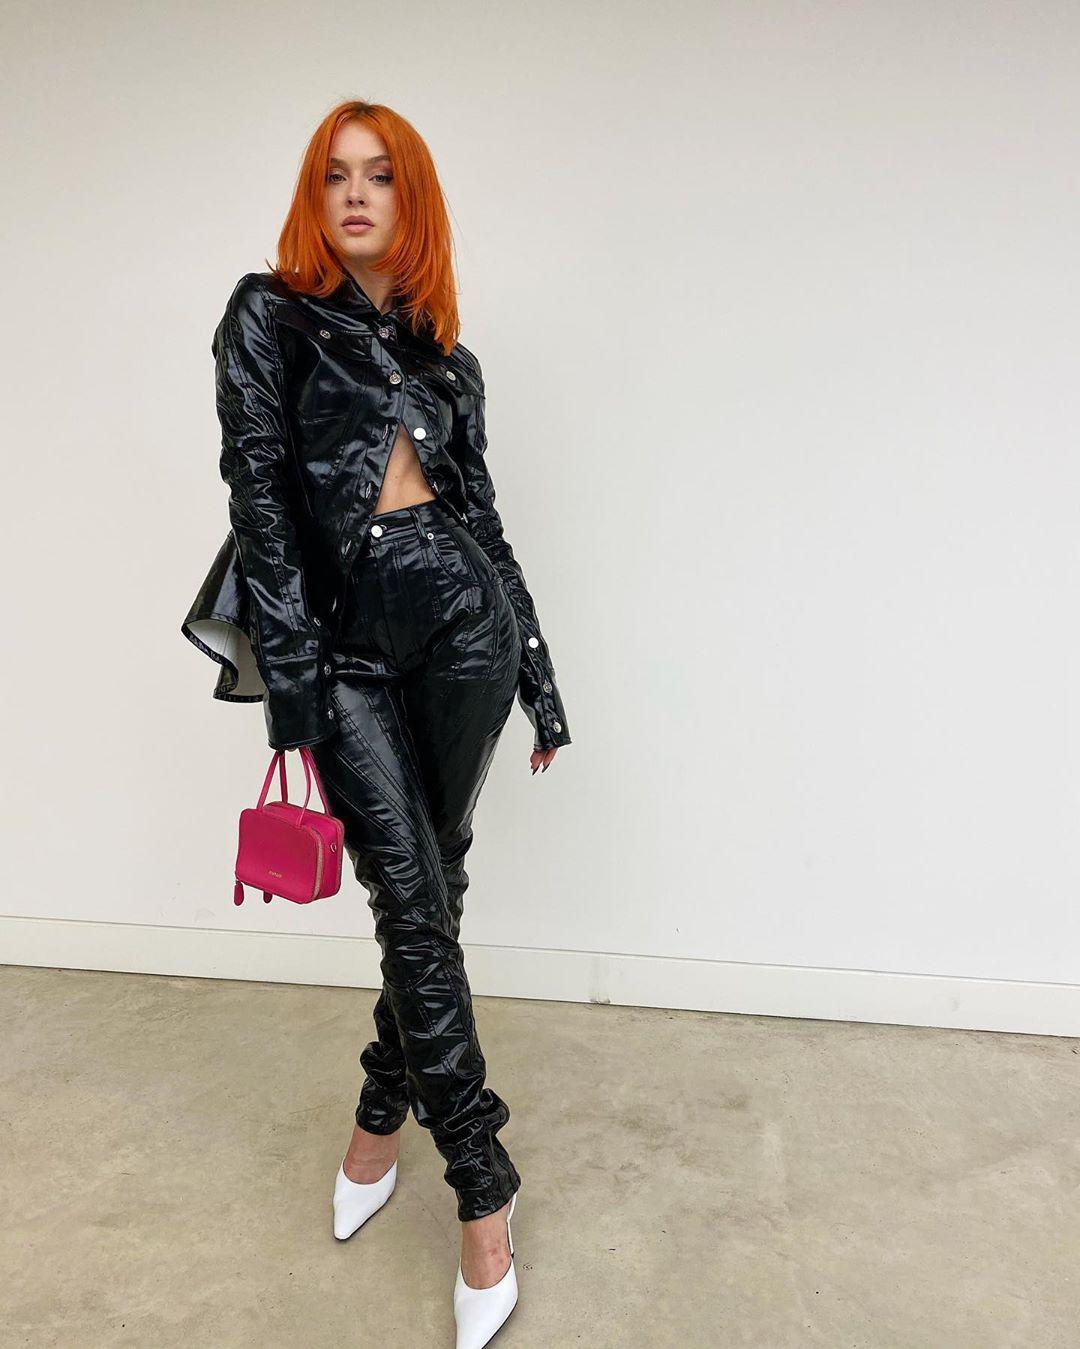 Zara-Larsson-Wallpapers-Insta-Fit-Bio-2